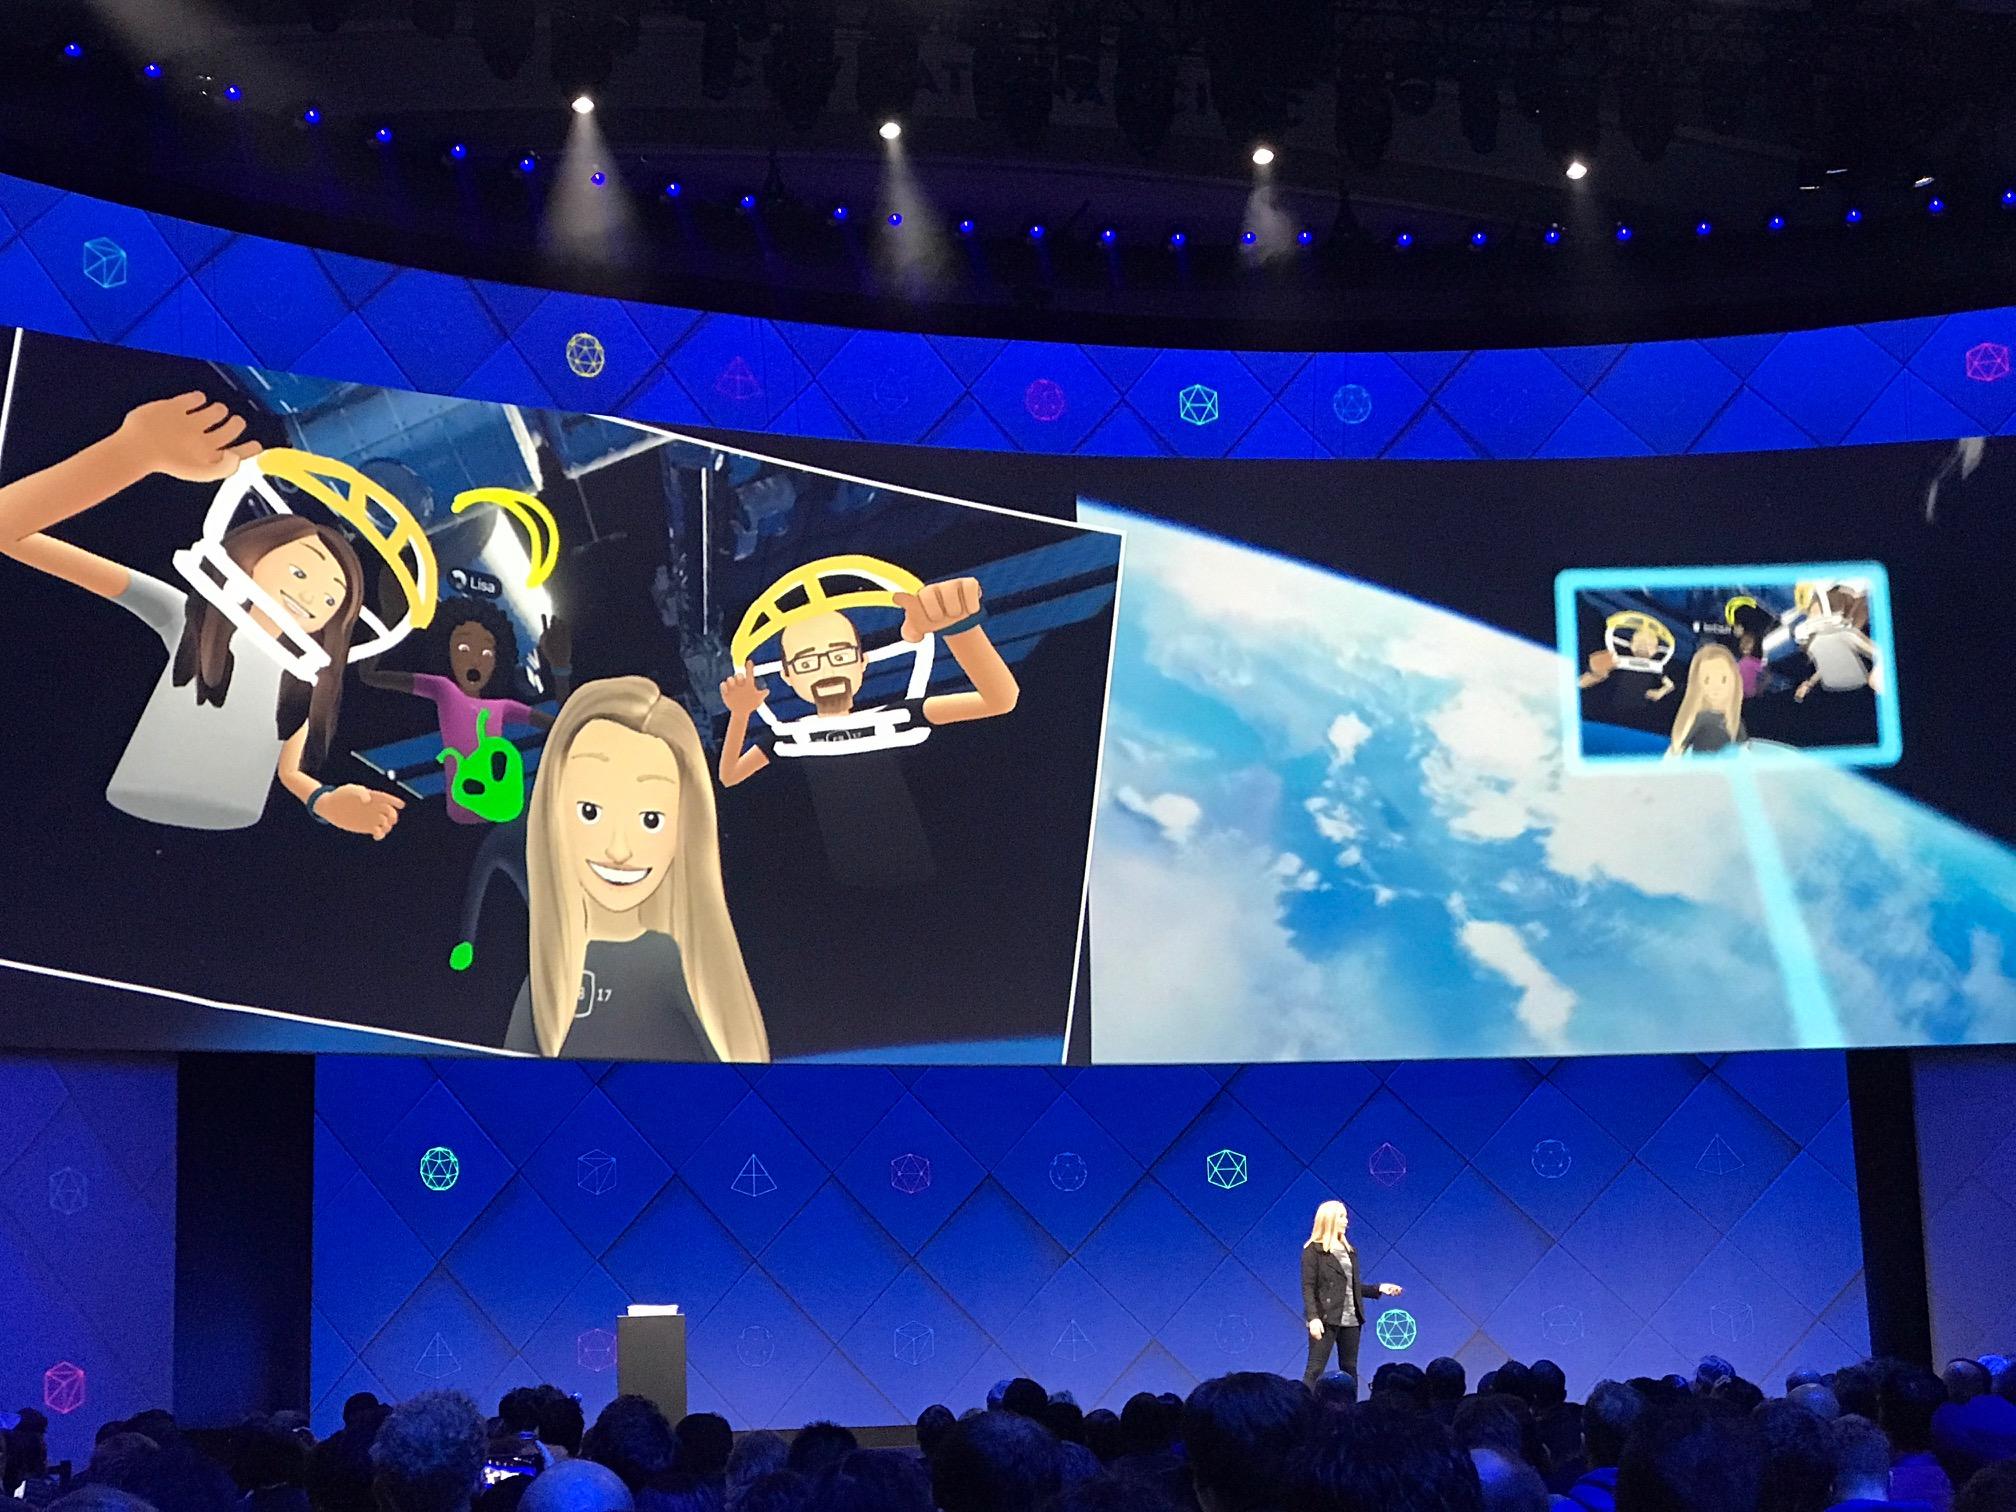 Slik ser Facebook Spaces ut i rommet - selfie-stikka er selvsagt på plass.